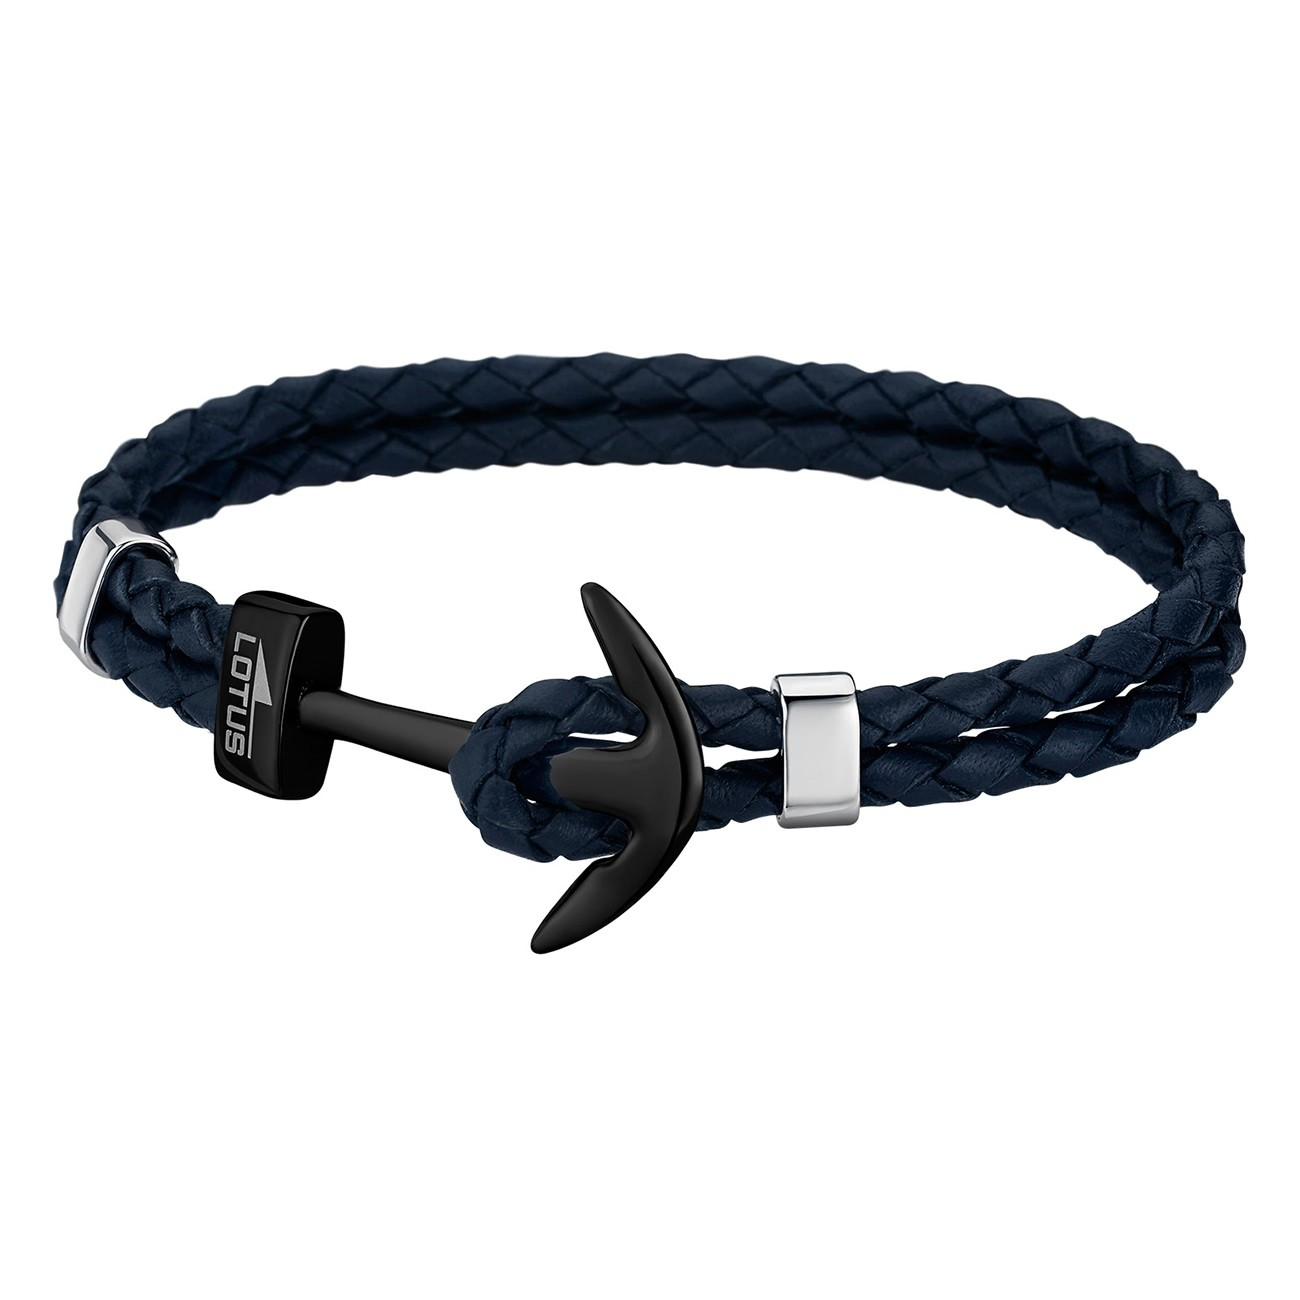 LOTUS Style Armband Herren Leder blau LS1832-2/7 Anker Schmuck JLS1832-2-7